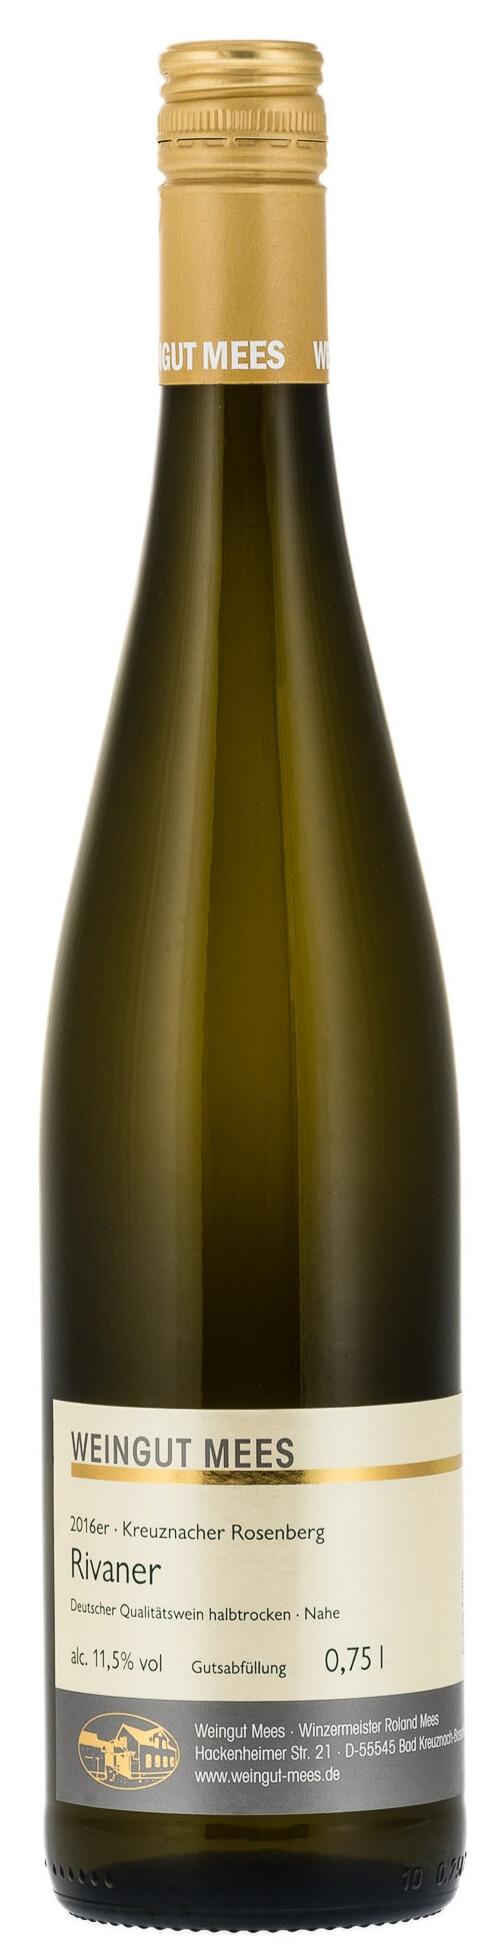 Rivaner halbtrocken Qualitätswein QbA Kreuznacher Rosenberg 2017 / Mees